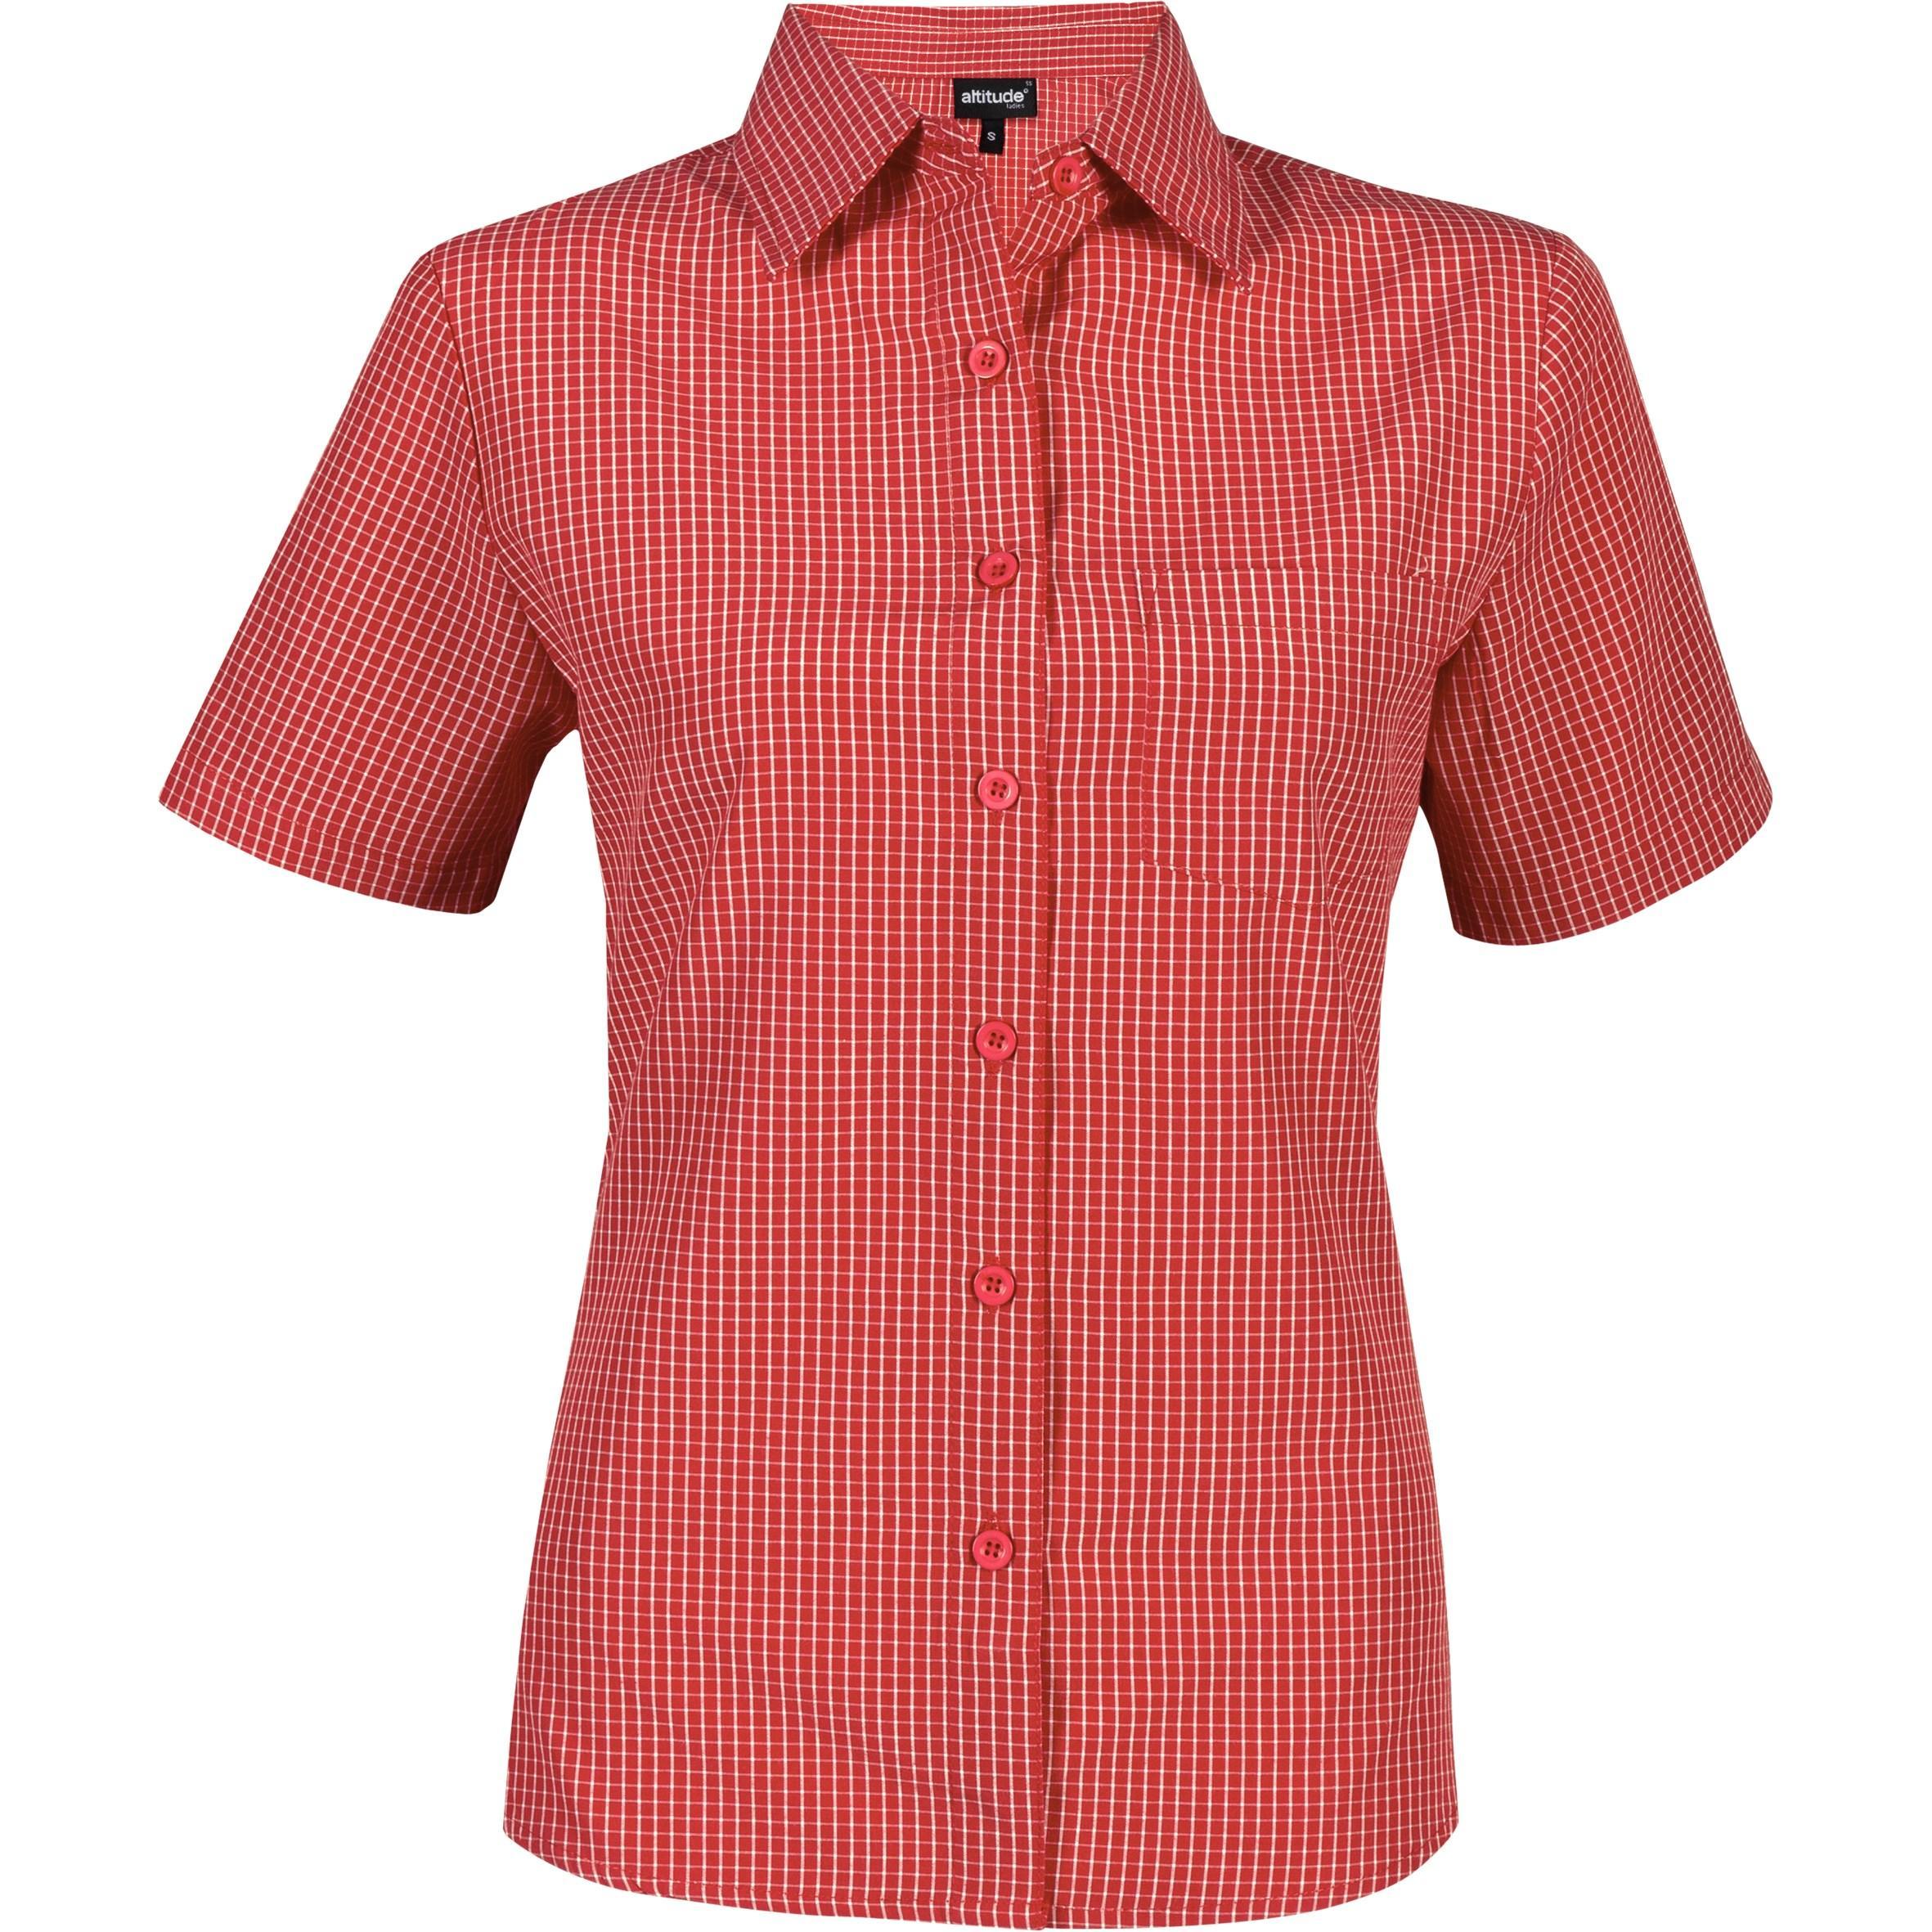 Ladies Short Sleeve Cedar Shirt - Red Only